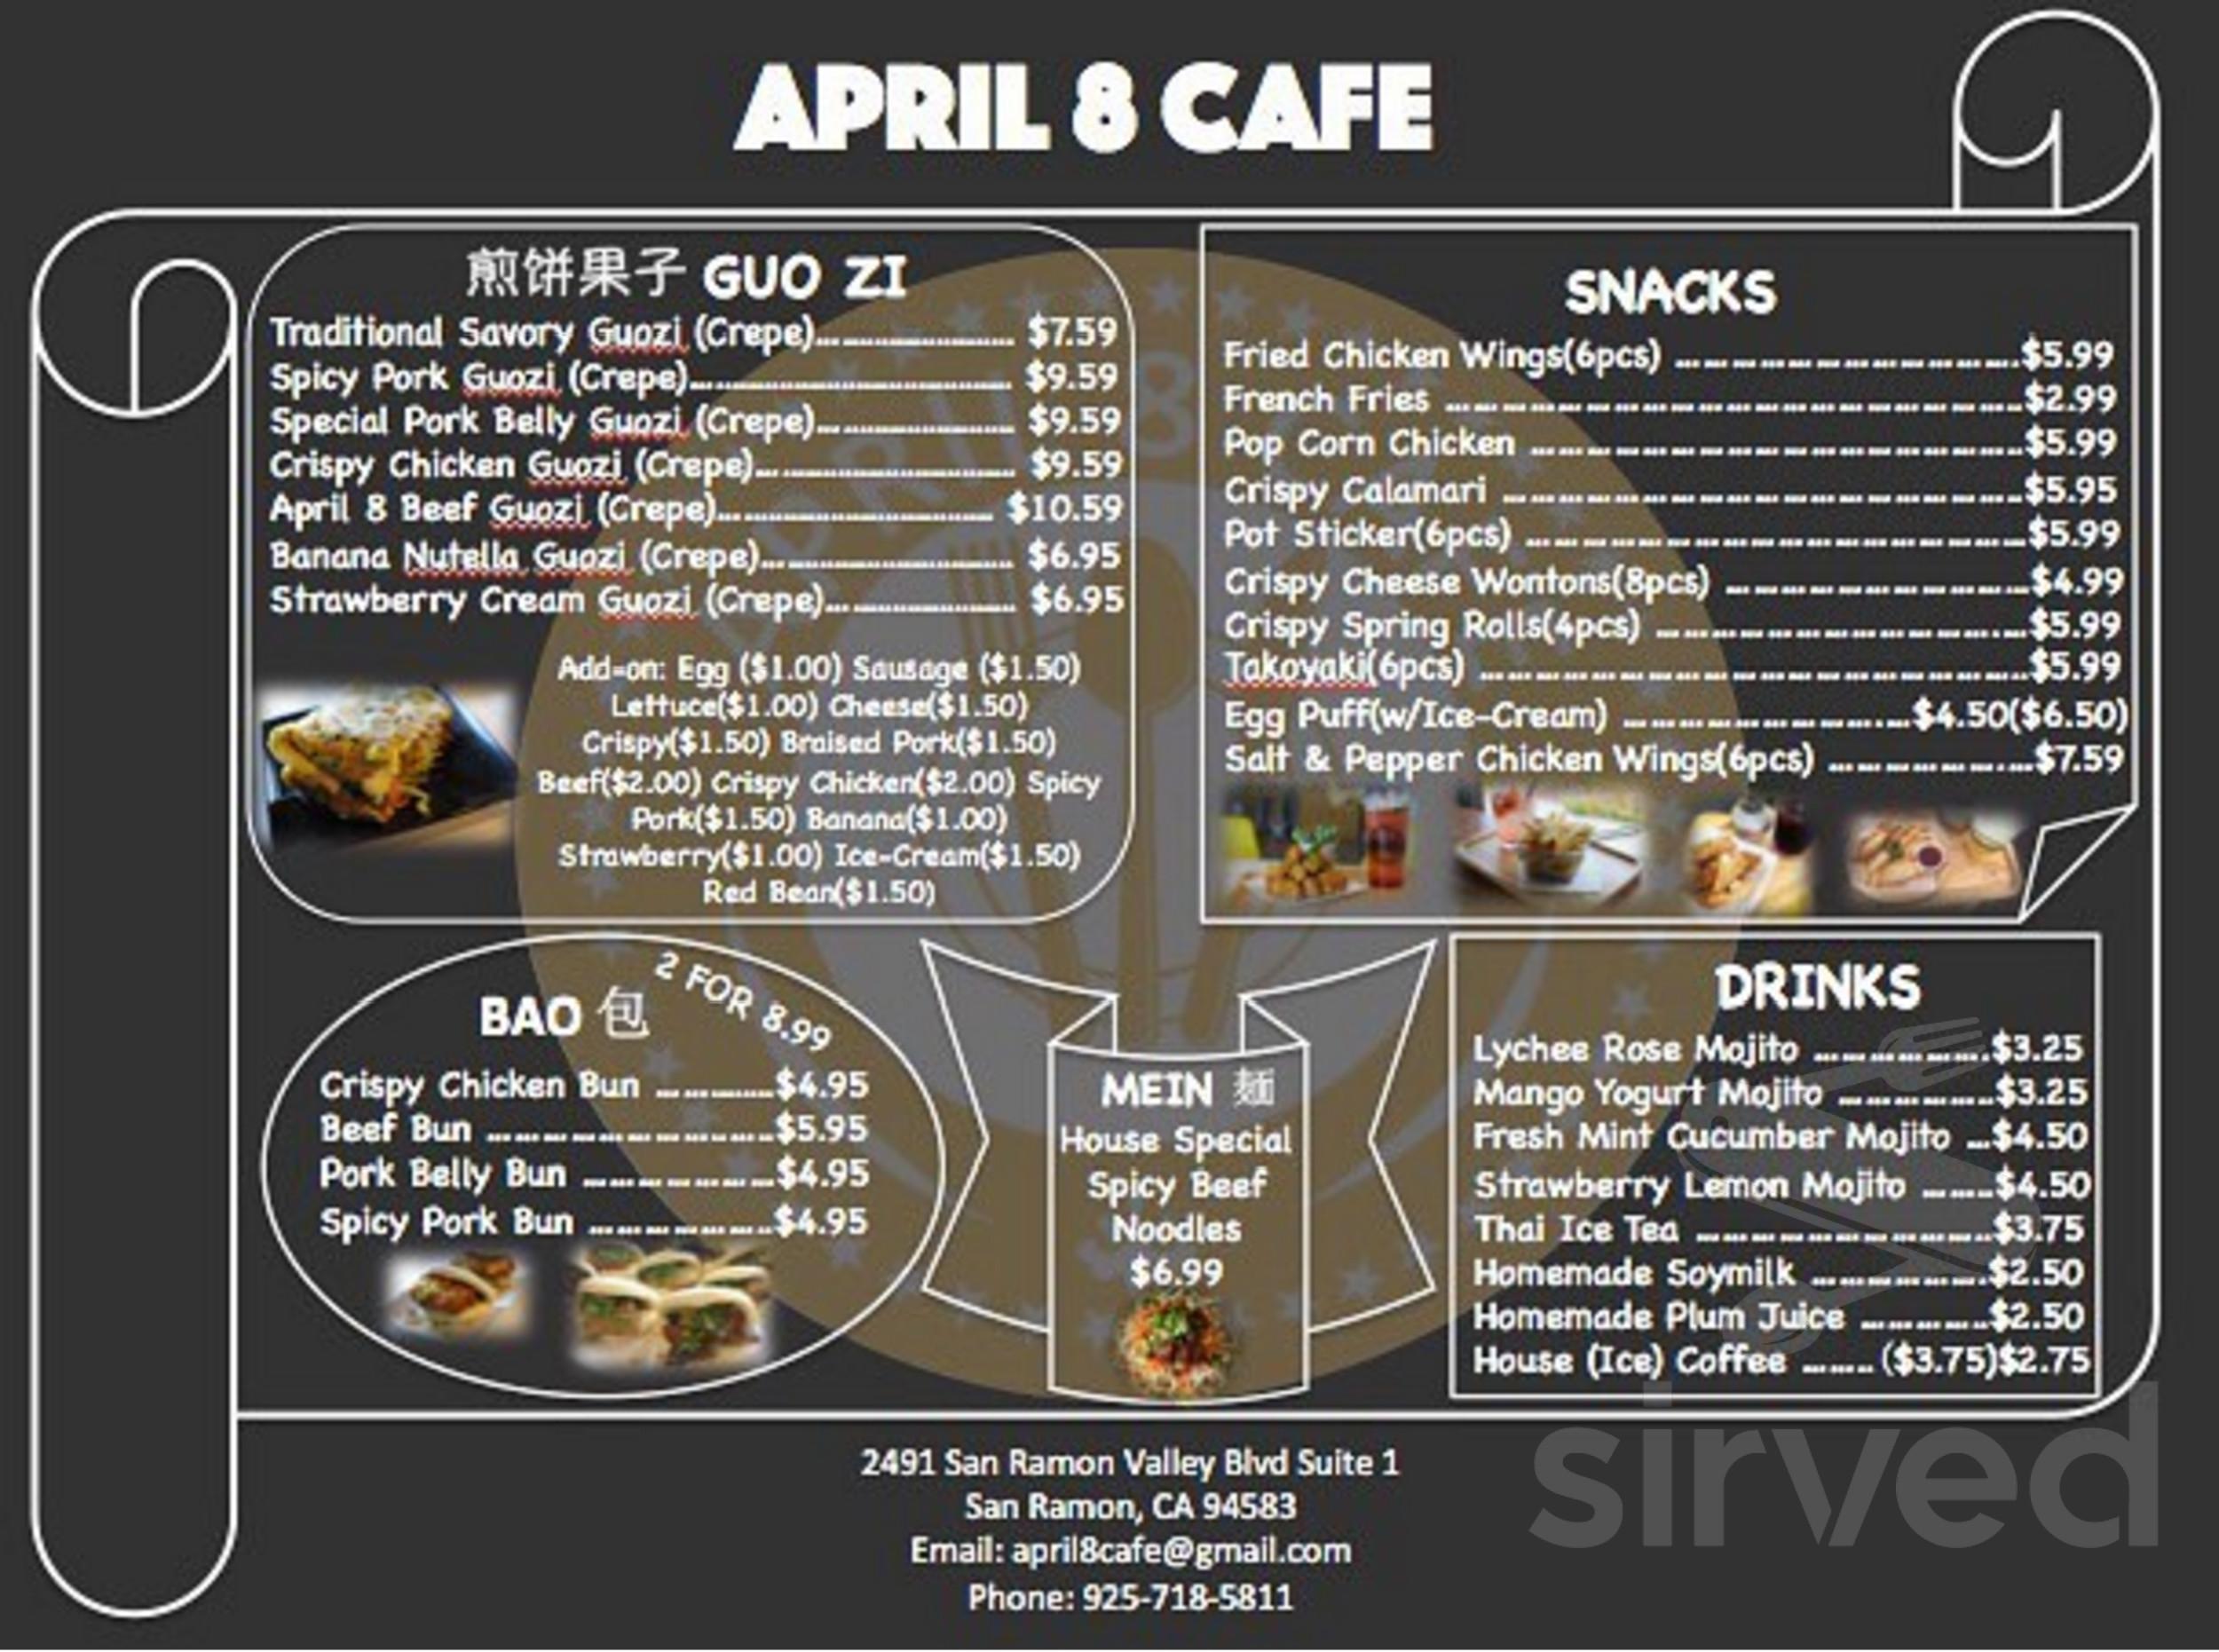 April 8 Cafe Menu In San Ramon California Usa